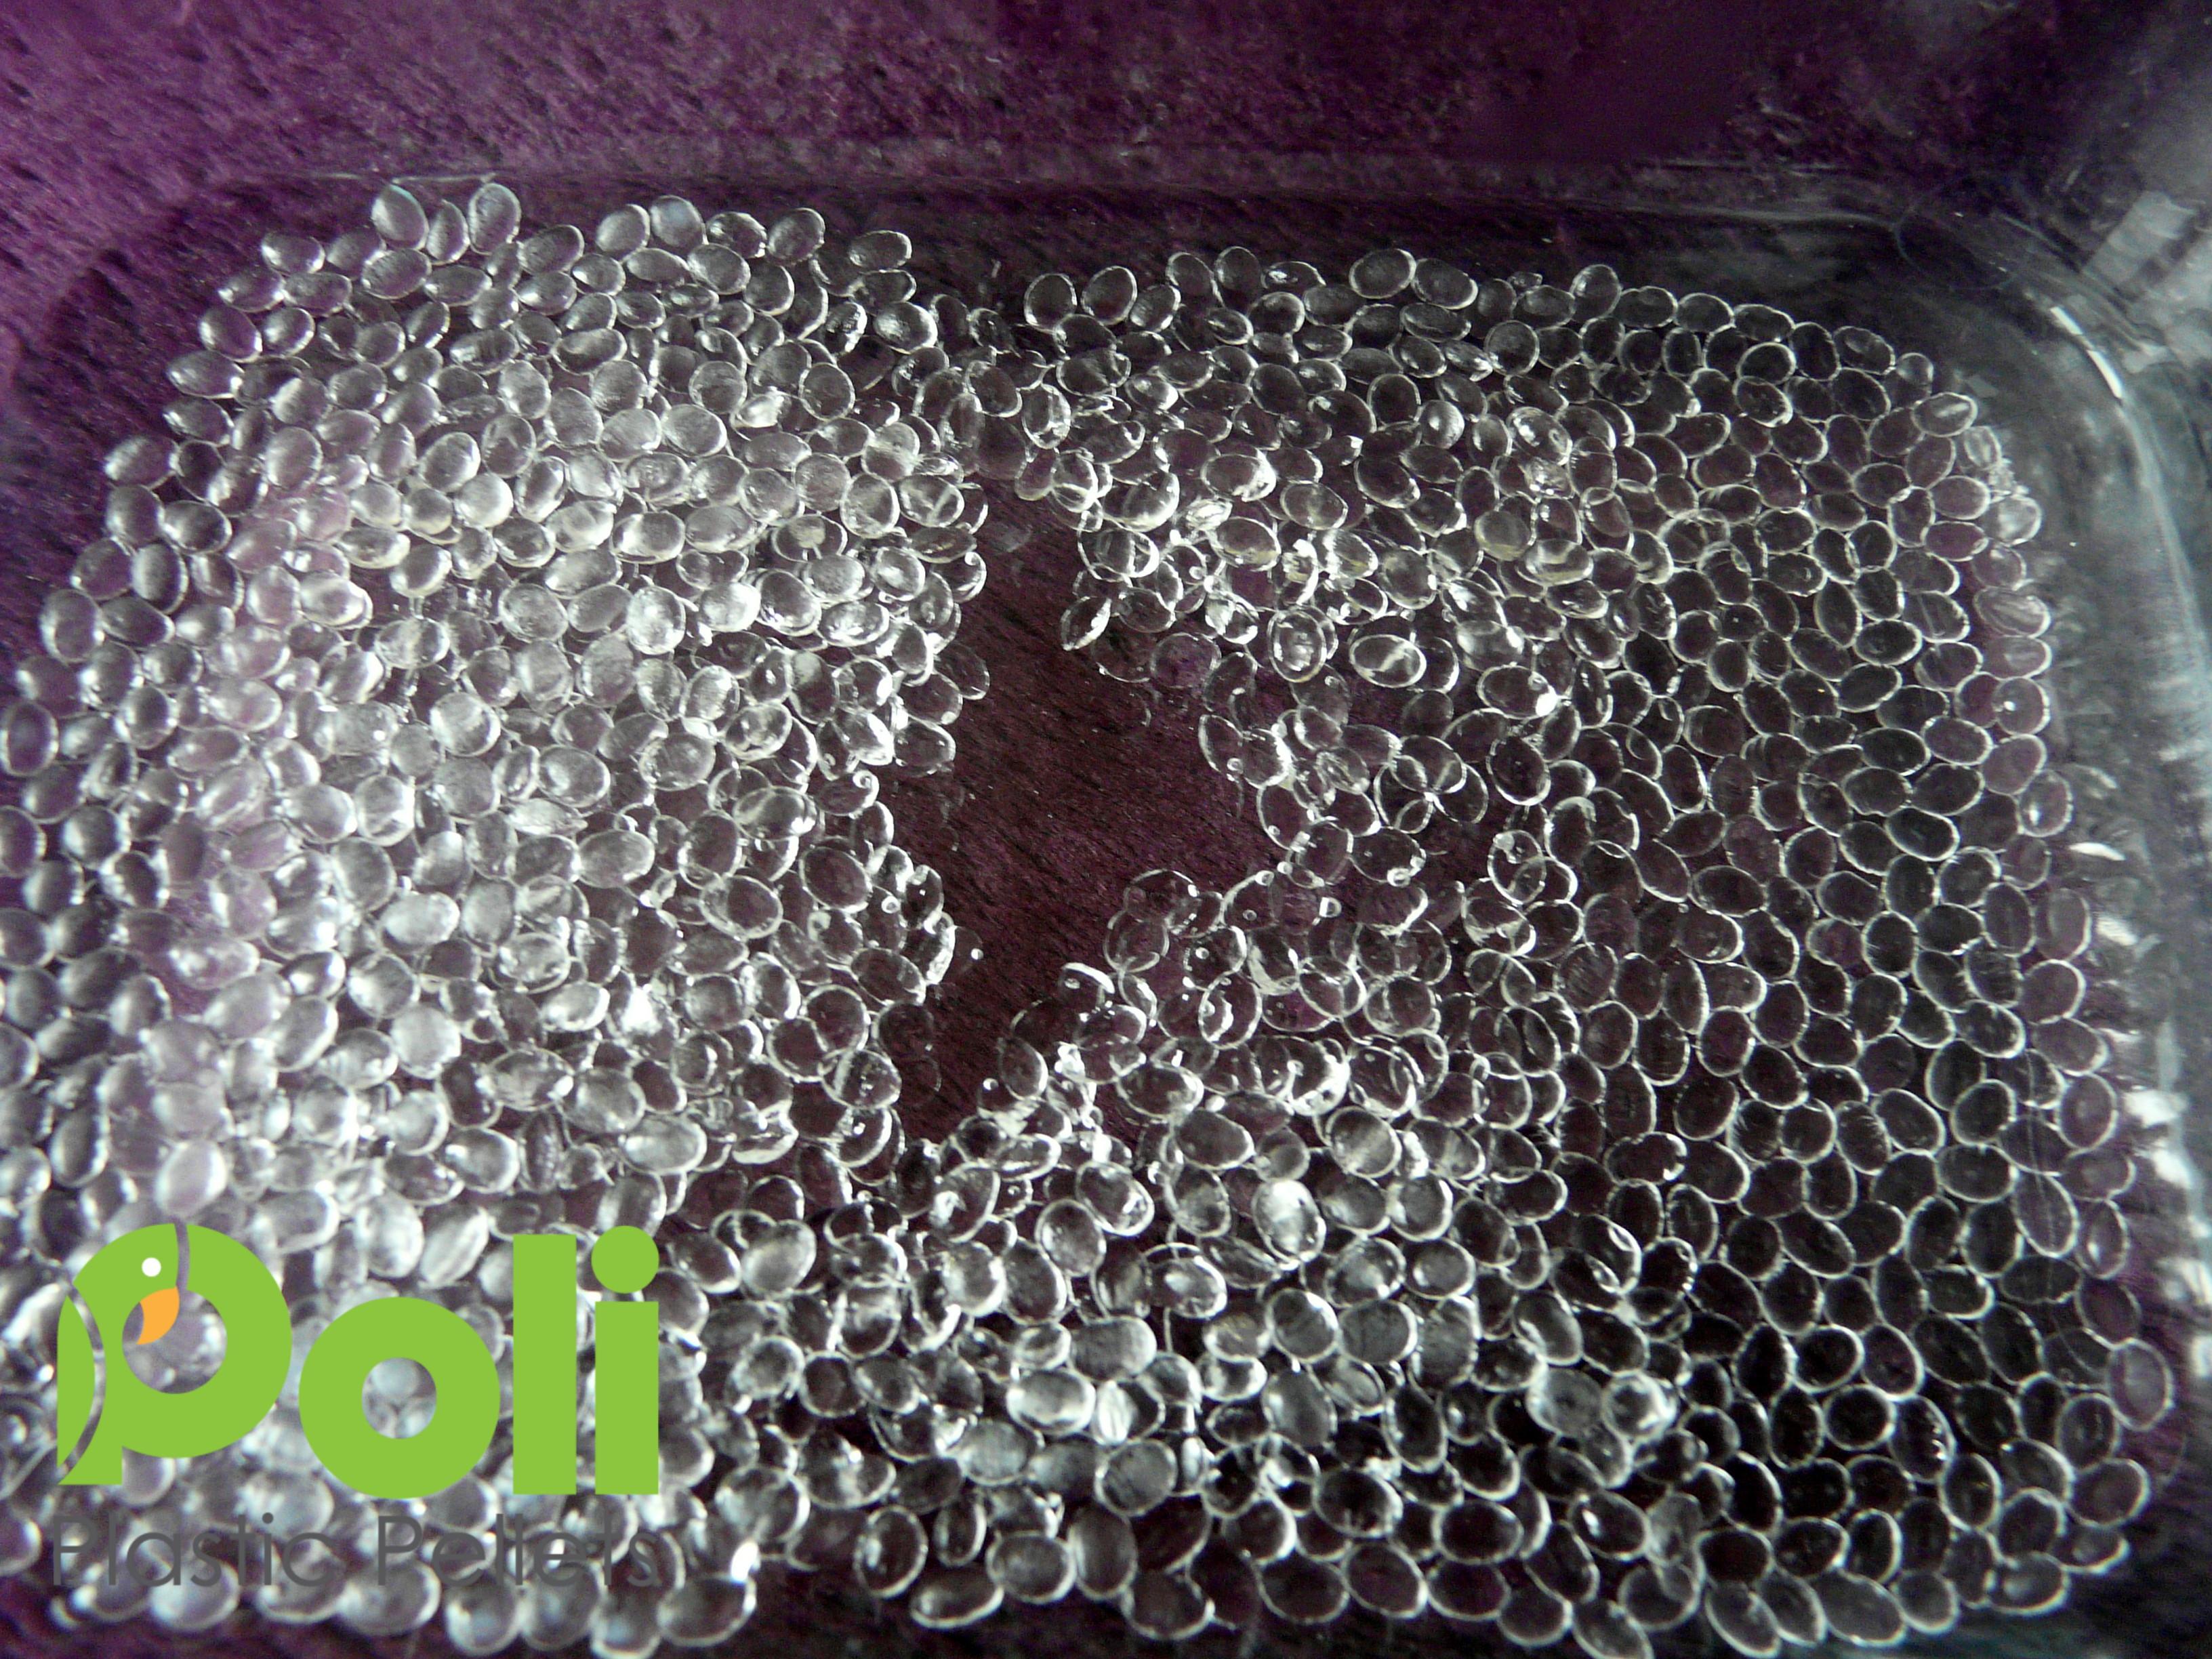 Polymorph Mouldable Plastic Pellets 62 176 C Variant